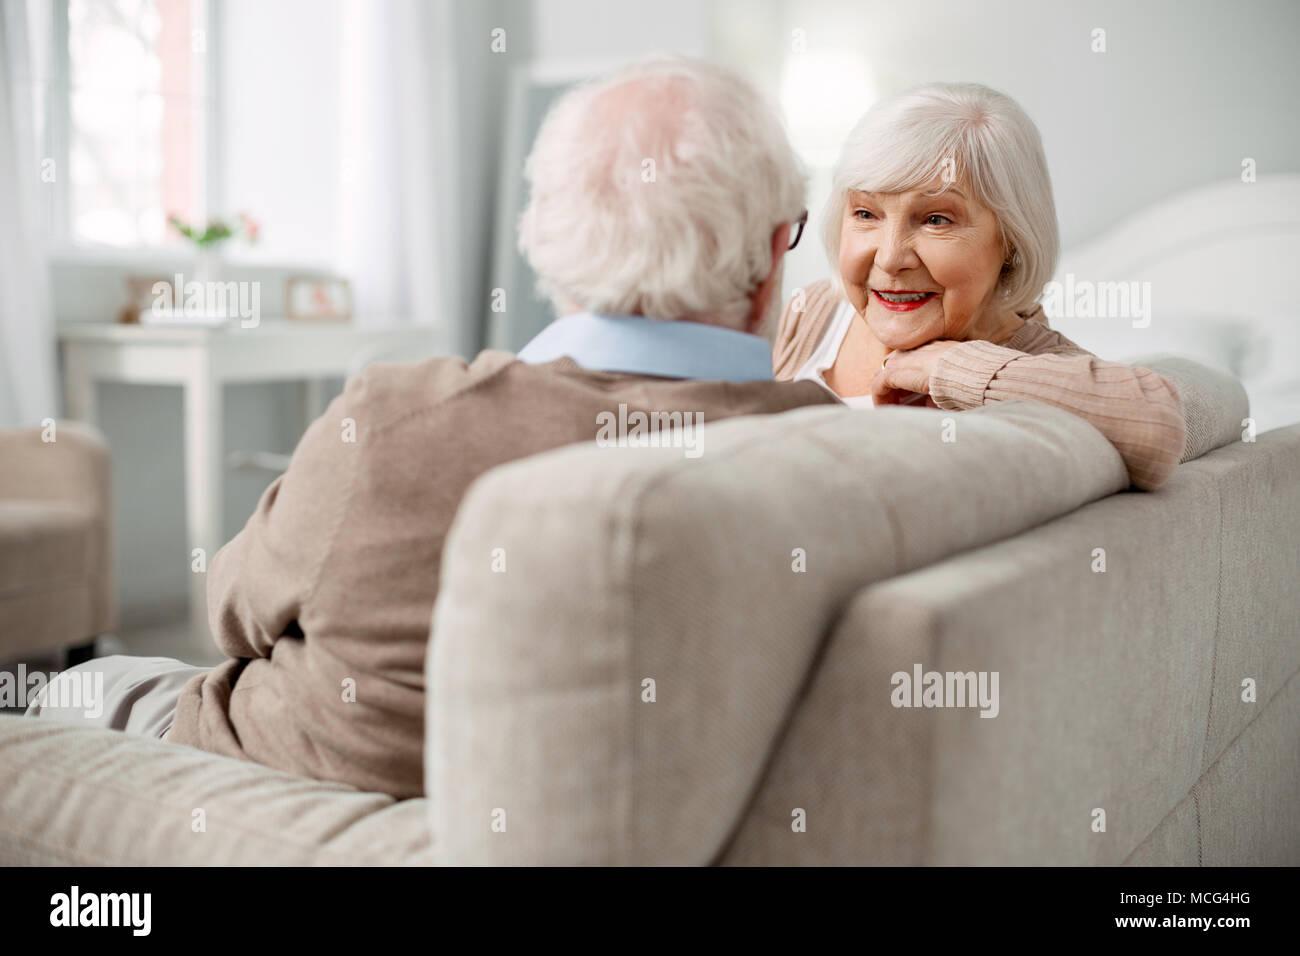 Senior positiva mujer mirando su marido cara Imagen De Stock